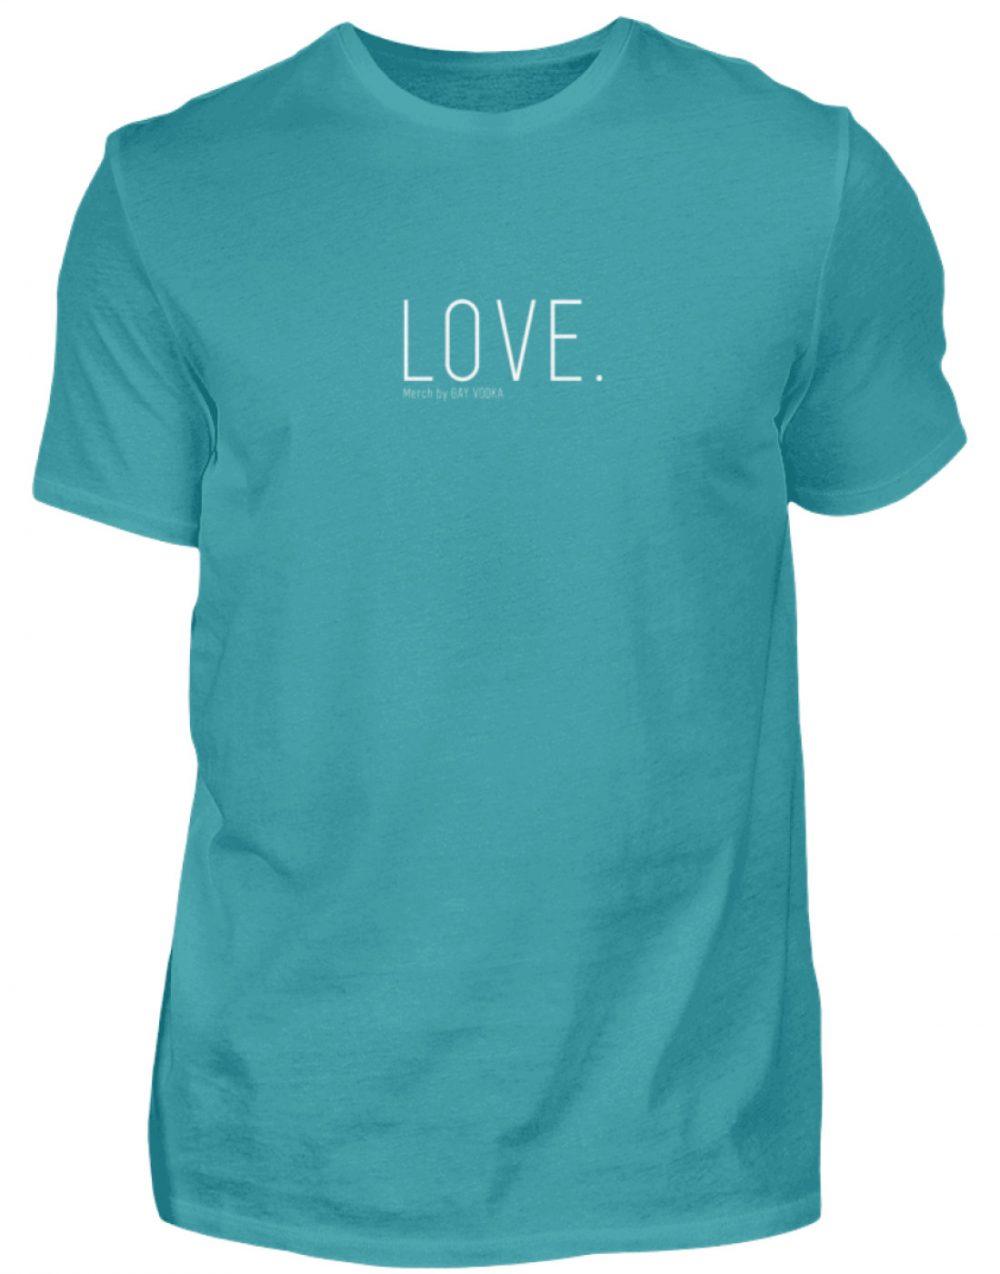 LOVE. - Herren Shirt-1242